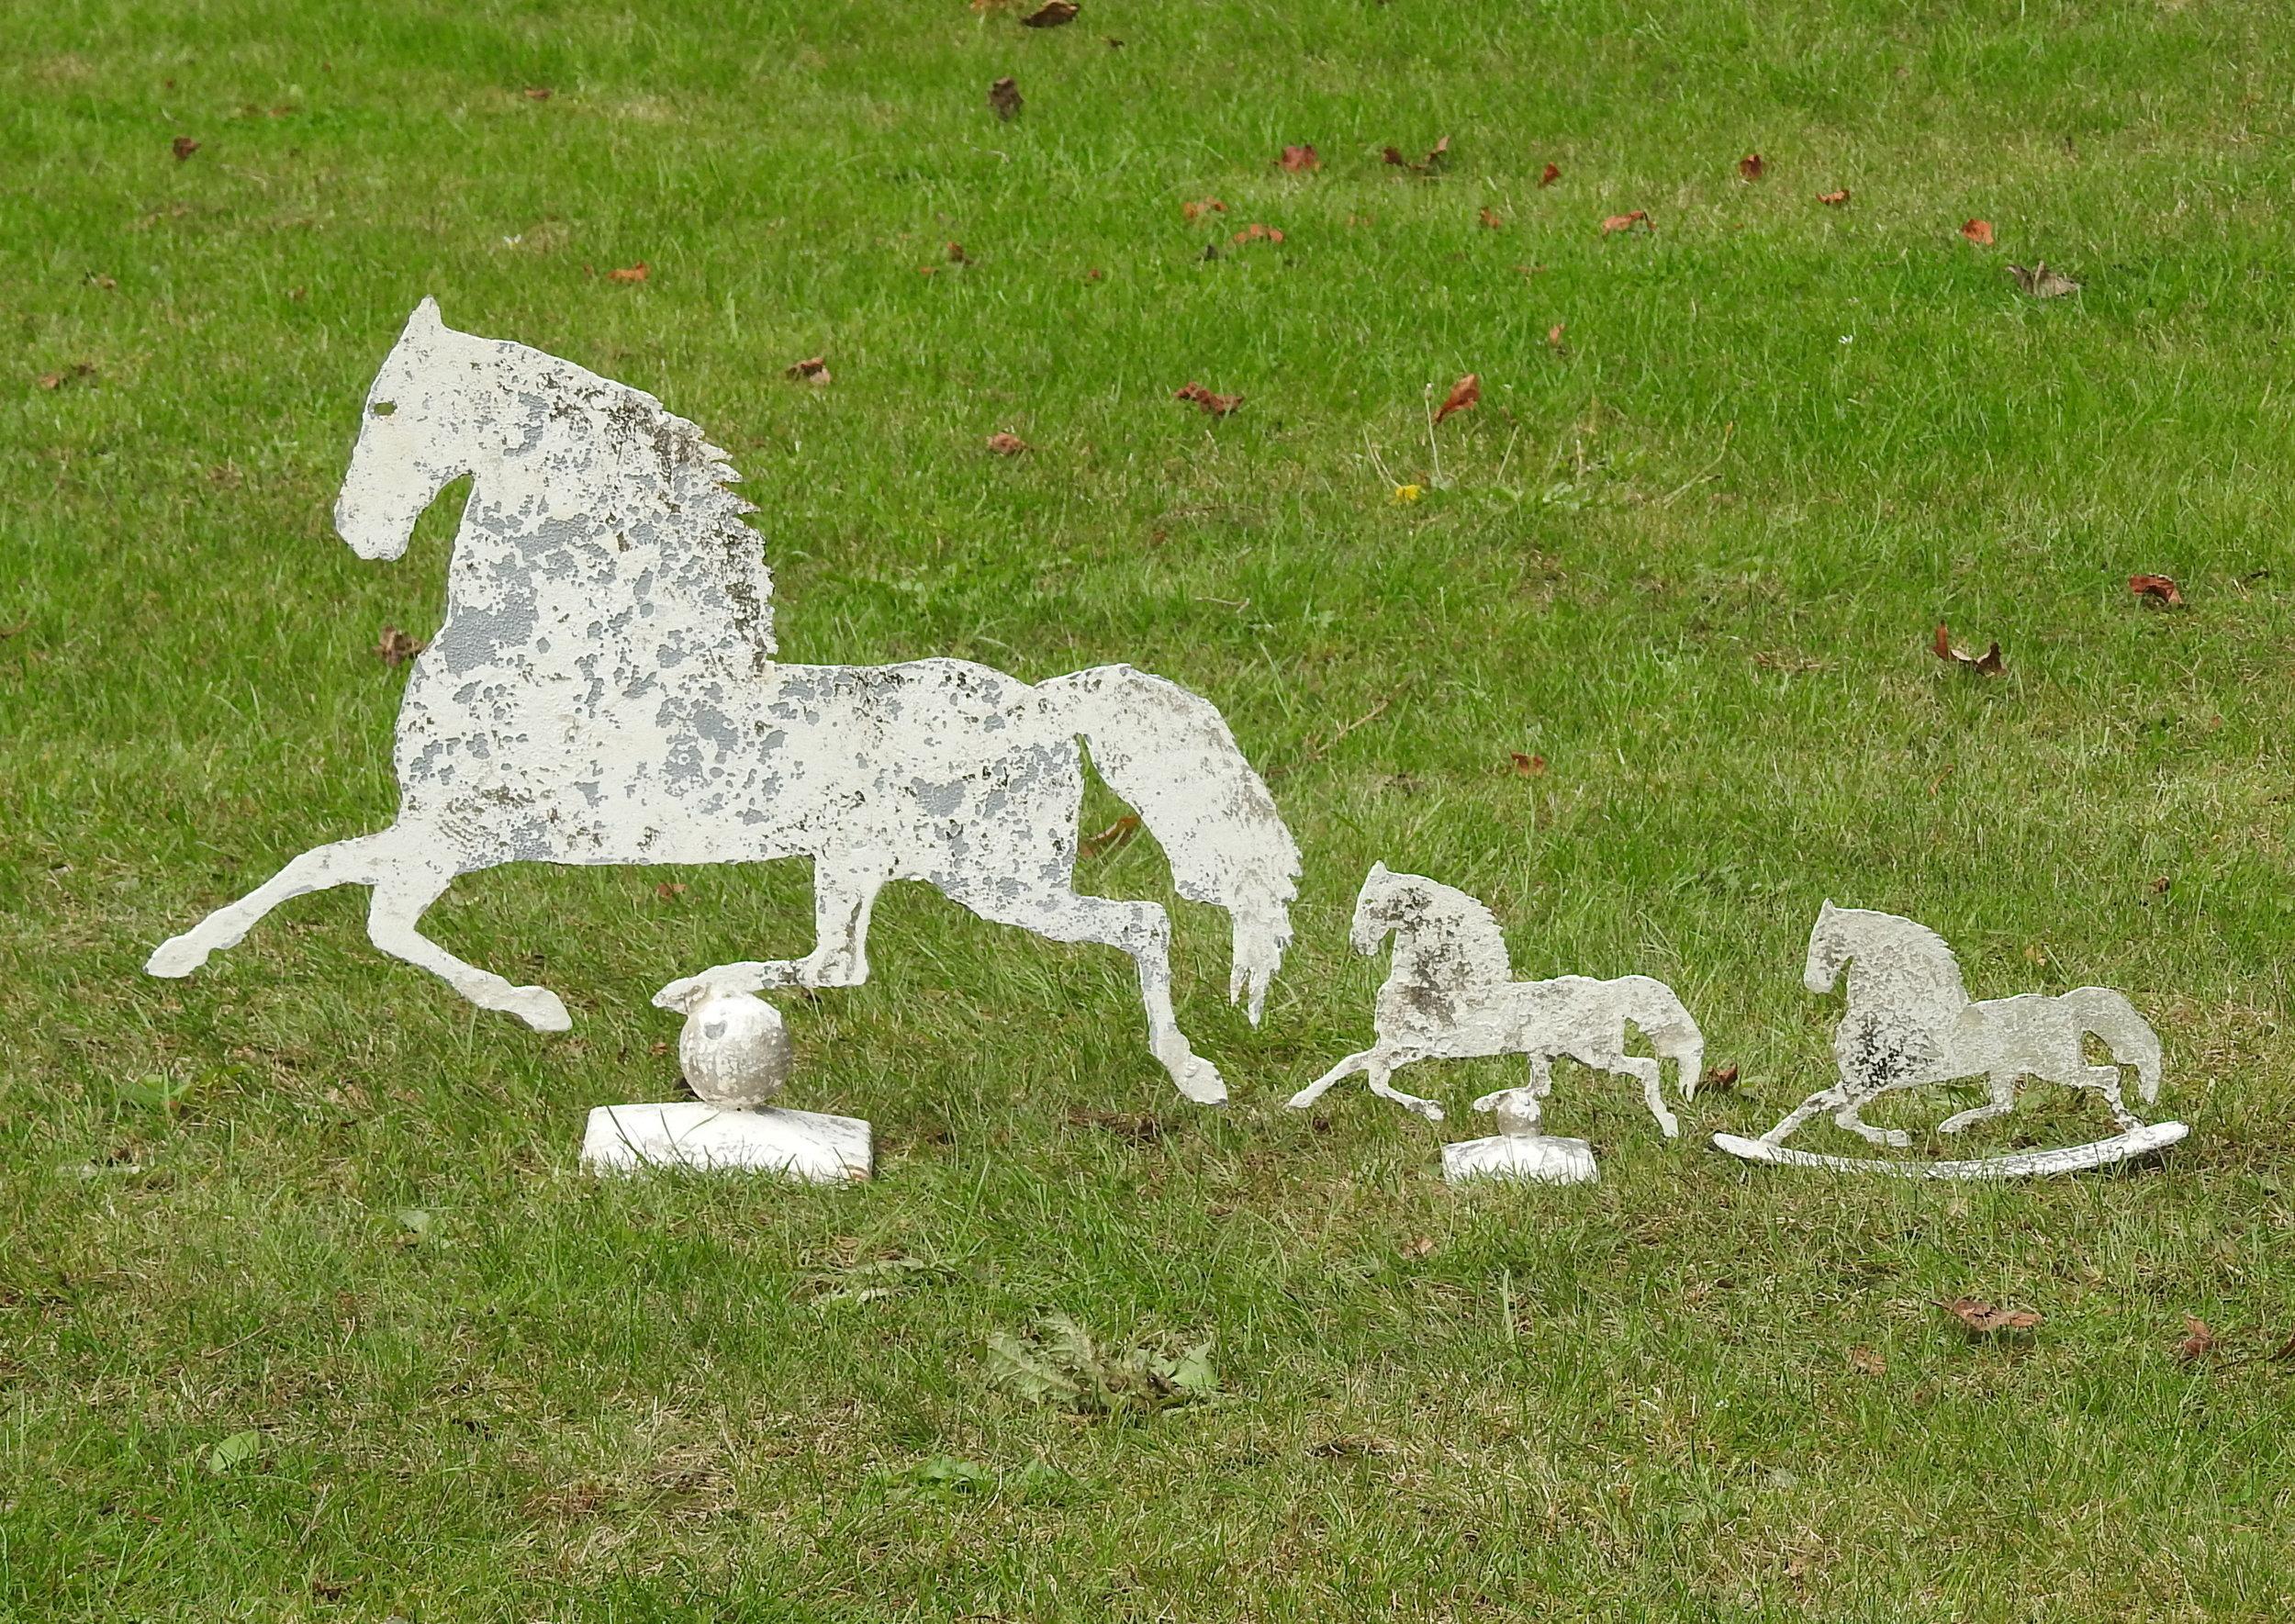 Galloping Horses - £85 & £28 - Medium: 50 x 37cmMini: 12 x 21cm